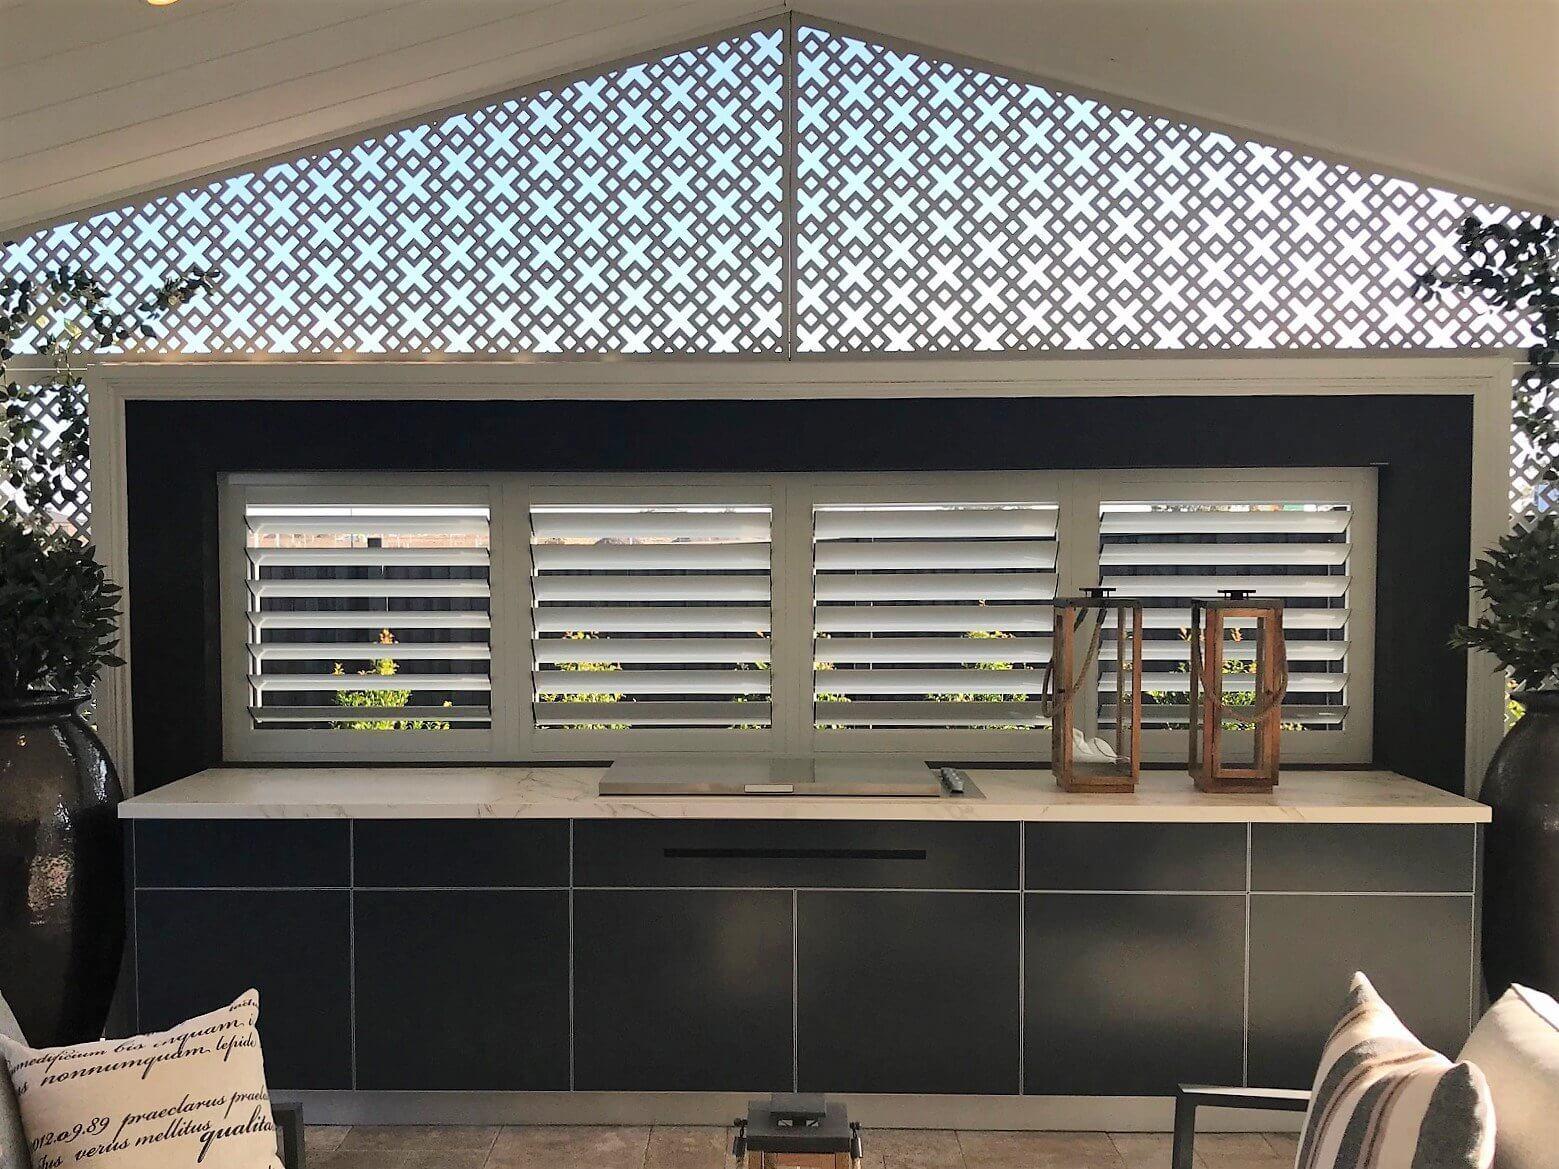 Beefeater Proline Lid Dekton Entzo Matte Steel grey Alfresco Kitchen Henley Homes Wollert 1